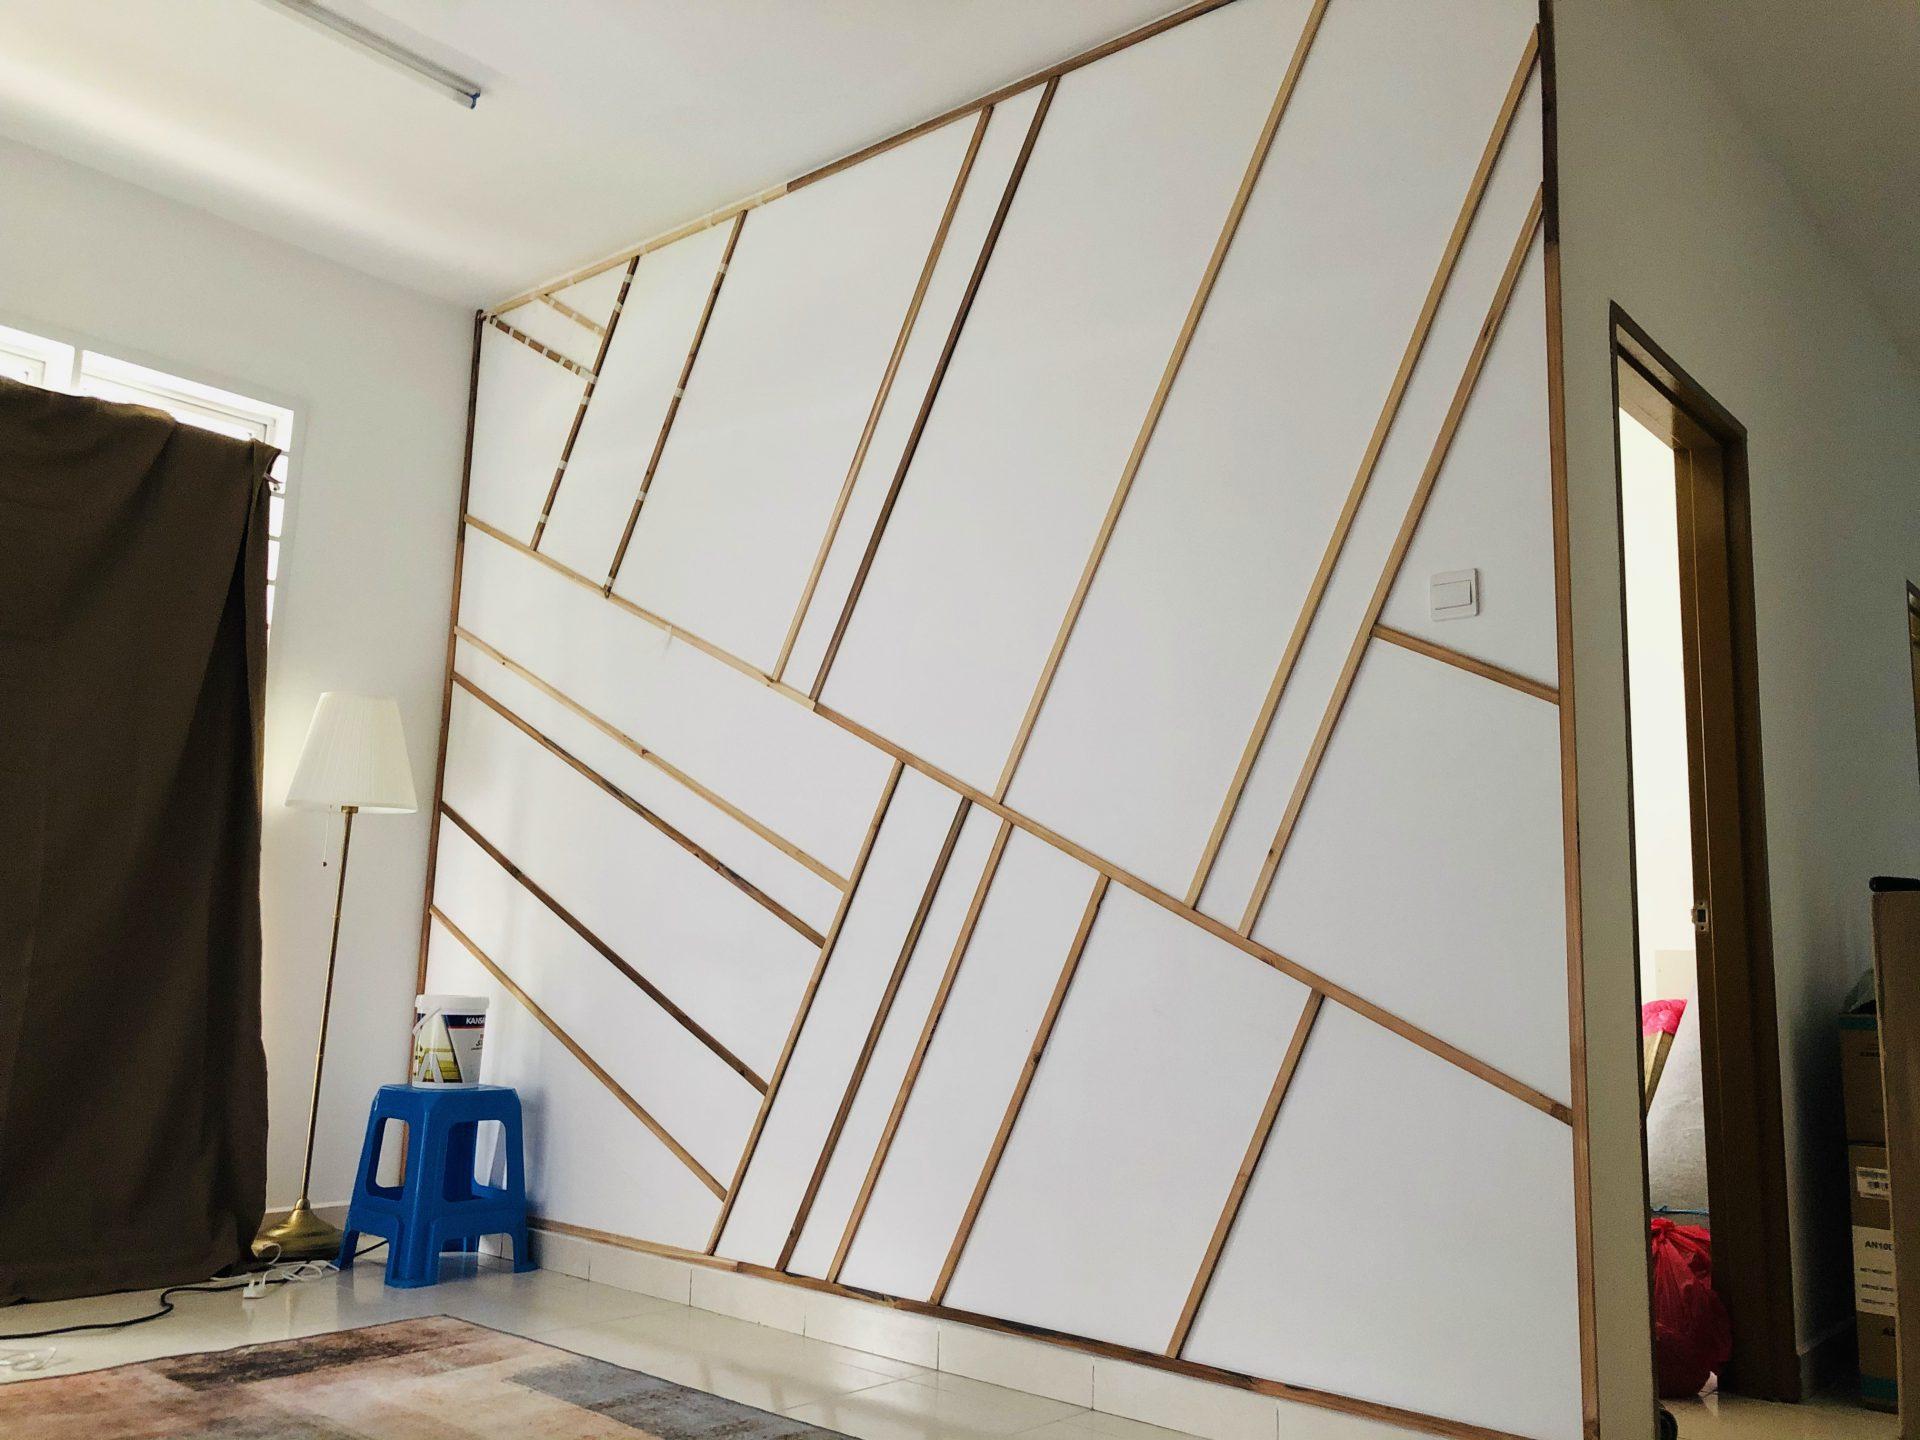 Projek DIY Accent Wall Dengan Bajet RM 210 5